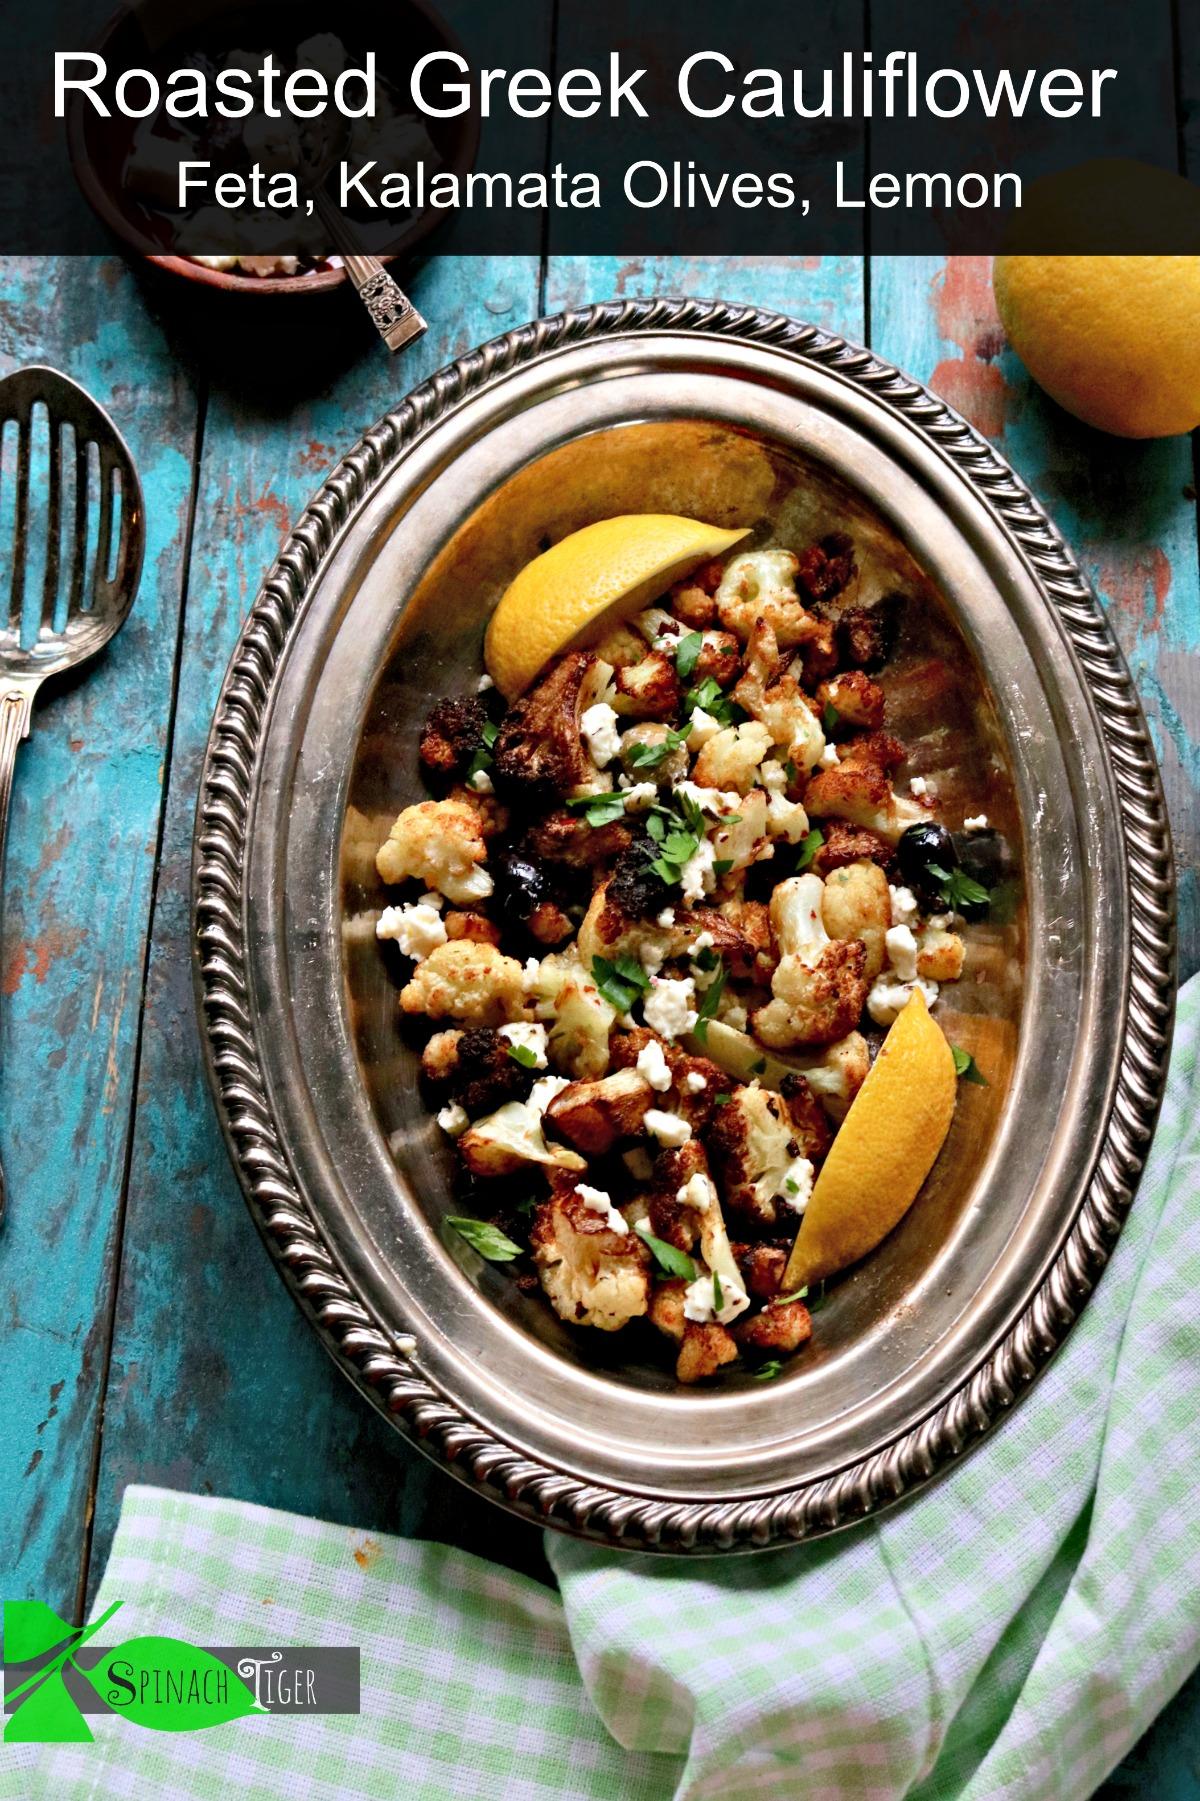 Easy Flash Fried Greek Cauliflower with Kalamata Olives, Feta